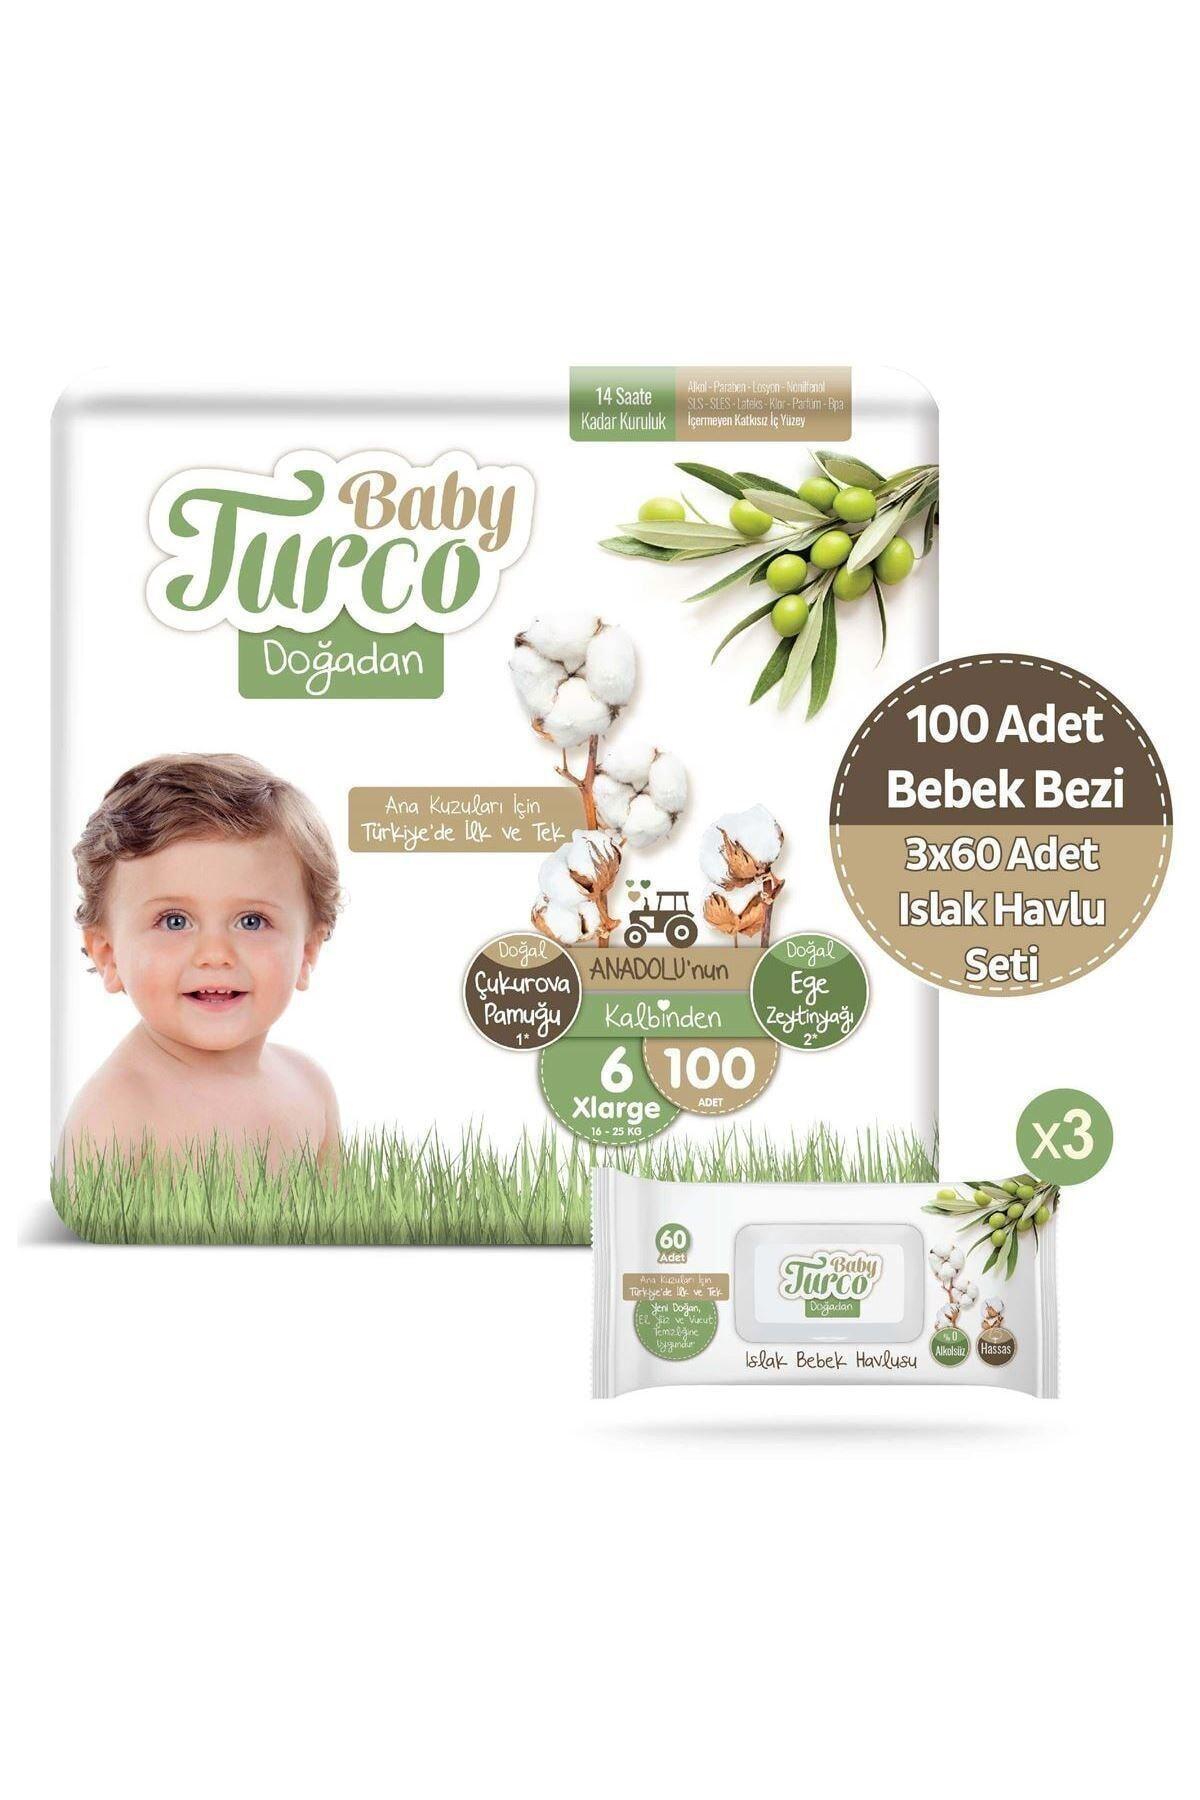 Baby Turco Doğadan 6 Numara Xlarge 100 Adet + 3x60 Doğadan Islak Havlu Seti 1